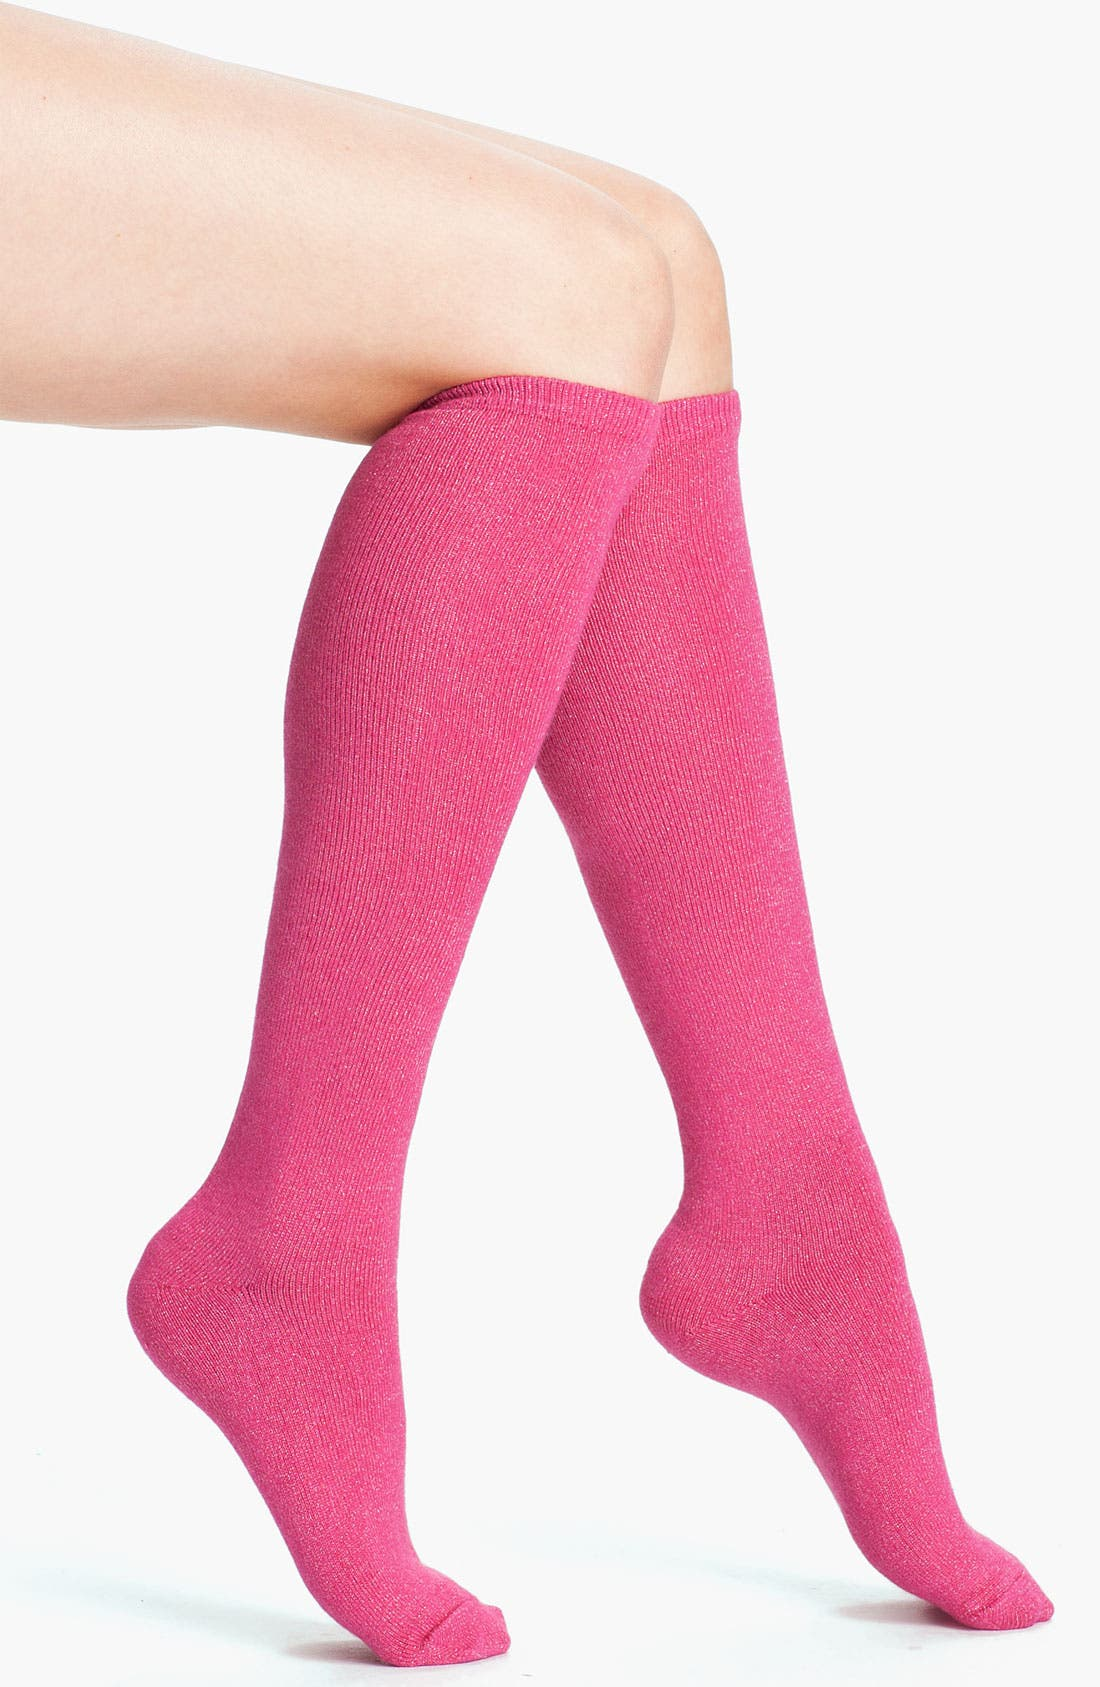 Main Image - kate spade new york 'holiday sparkle' knee high socks